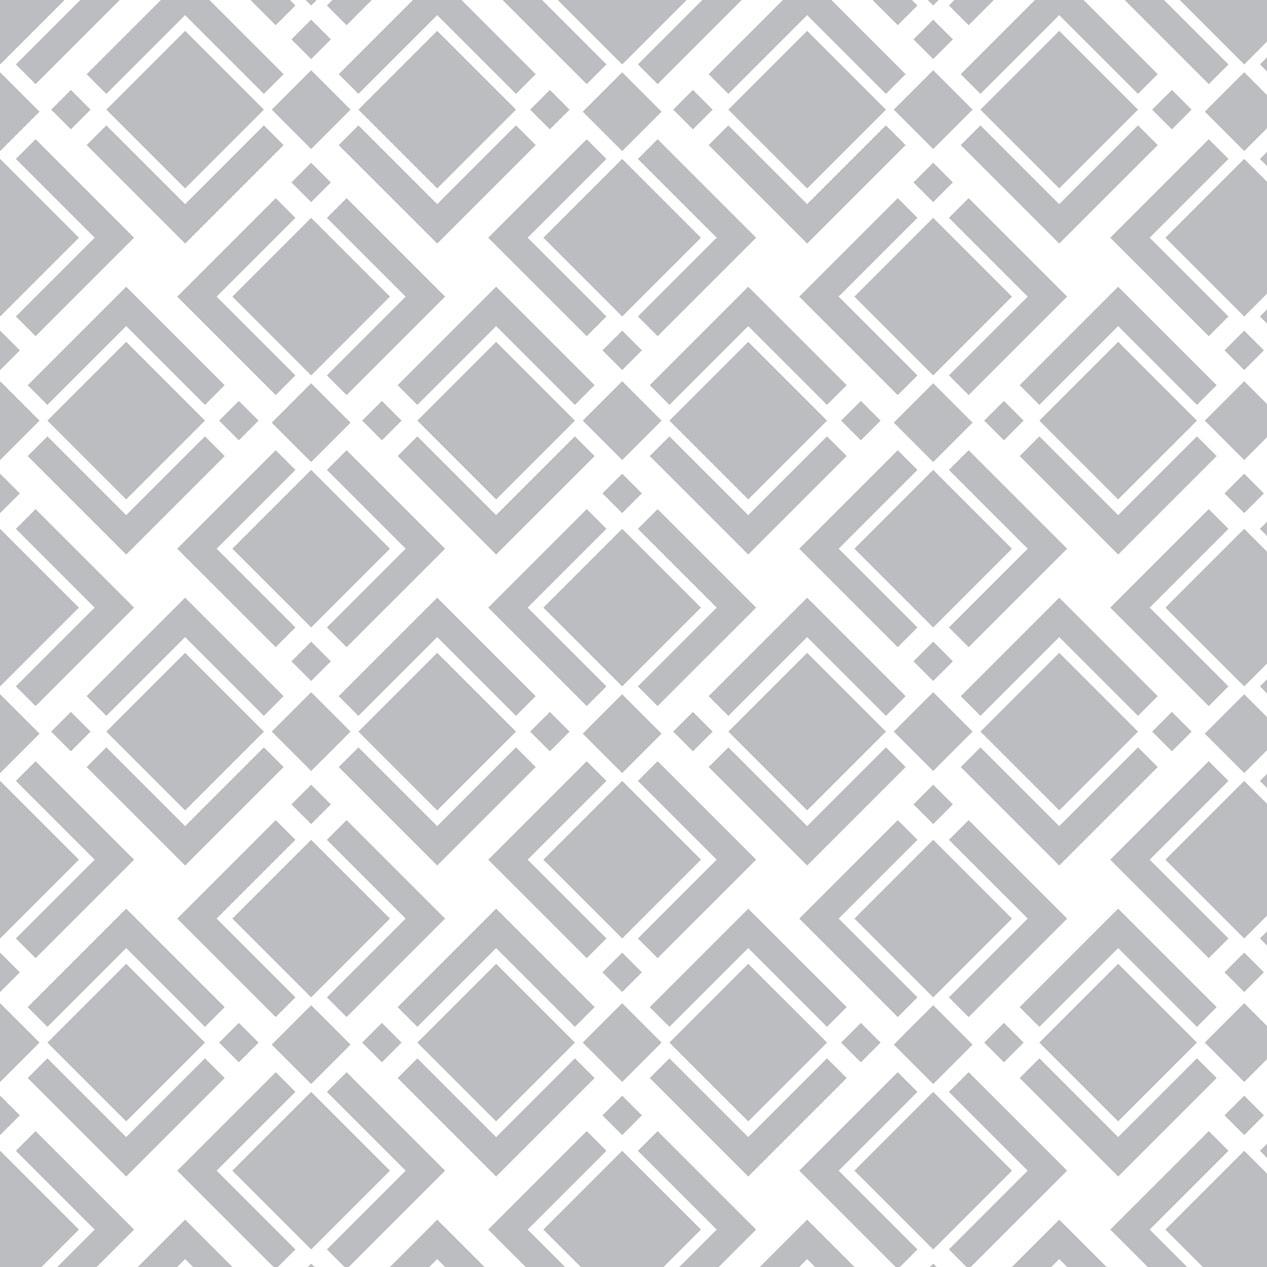 Papel de Parede Geométrico Losangos e Formas Cinza